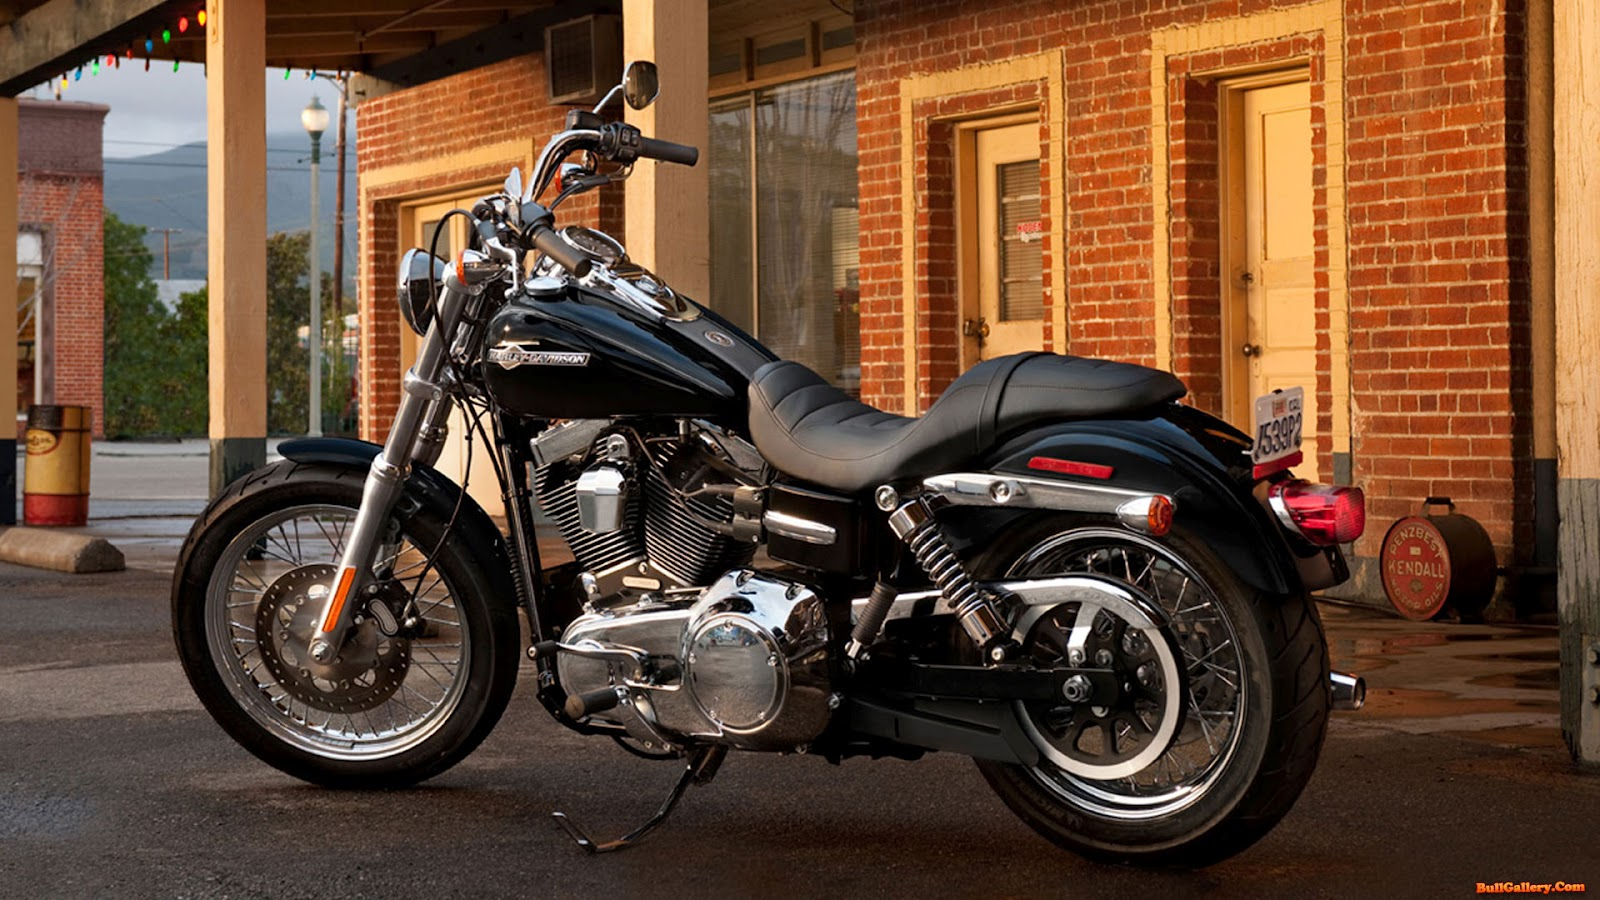 2013 Harley Davidson Dyna Super Glide Custom: Harley Davidson Dyna Super Glide Custom 2013 Wallpapers